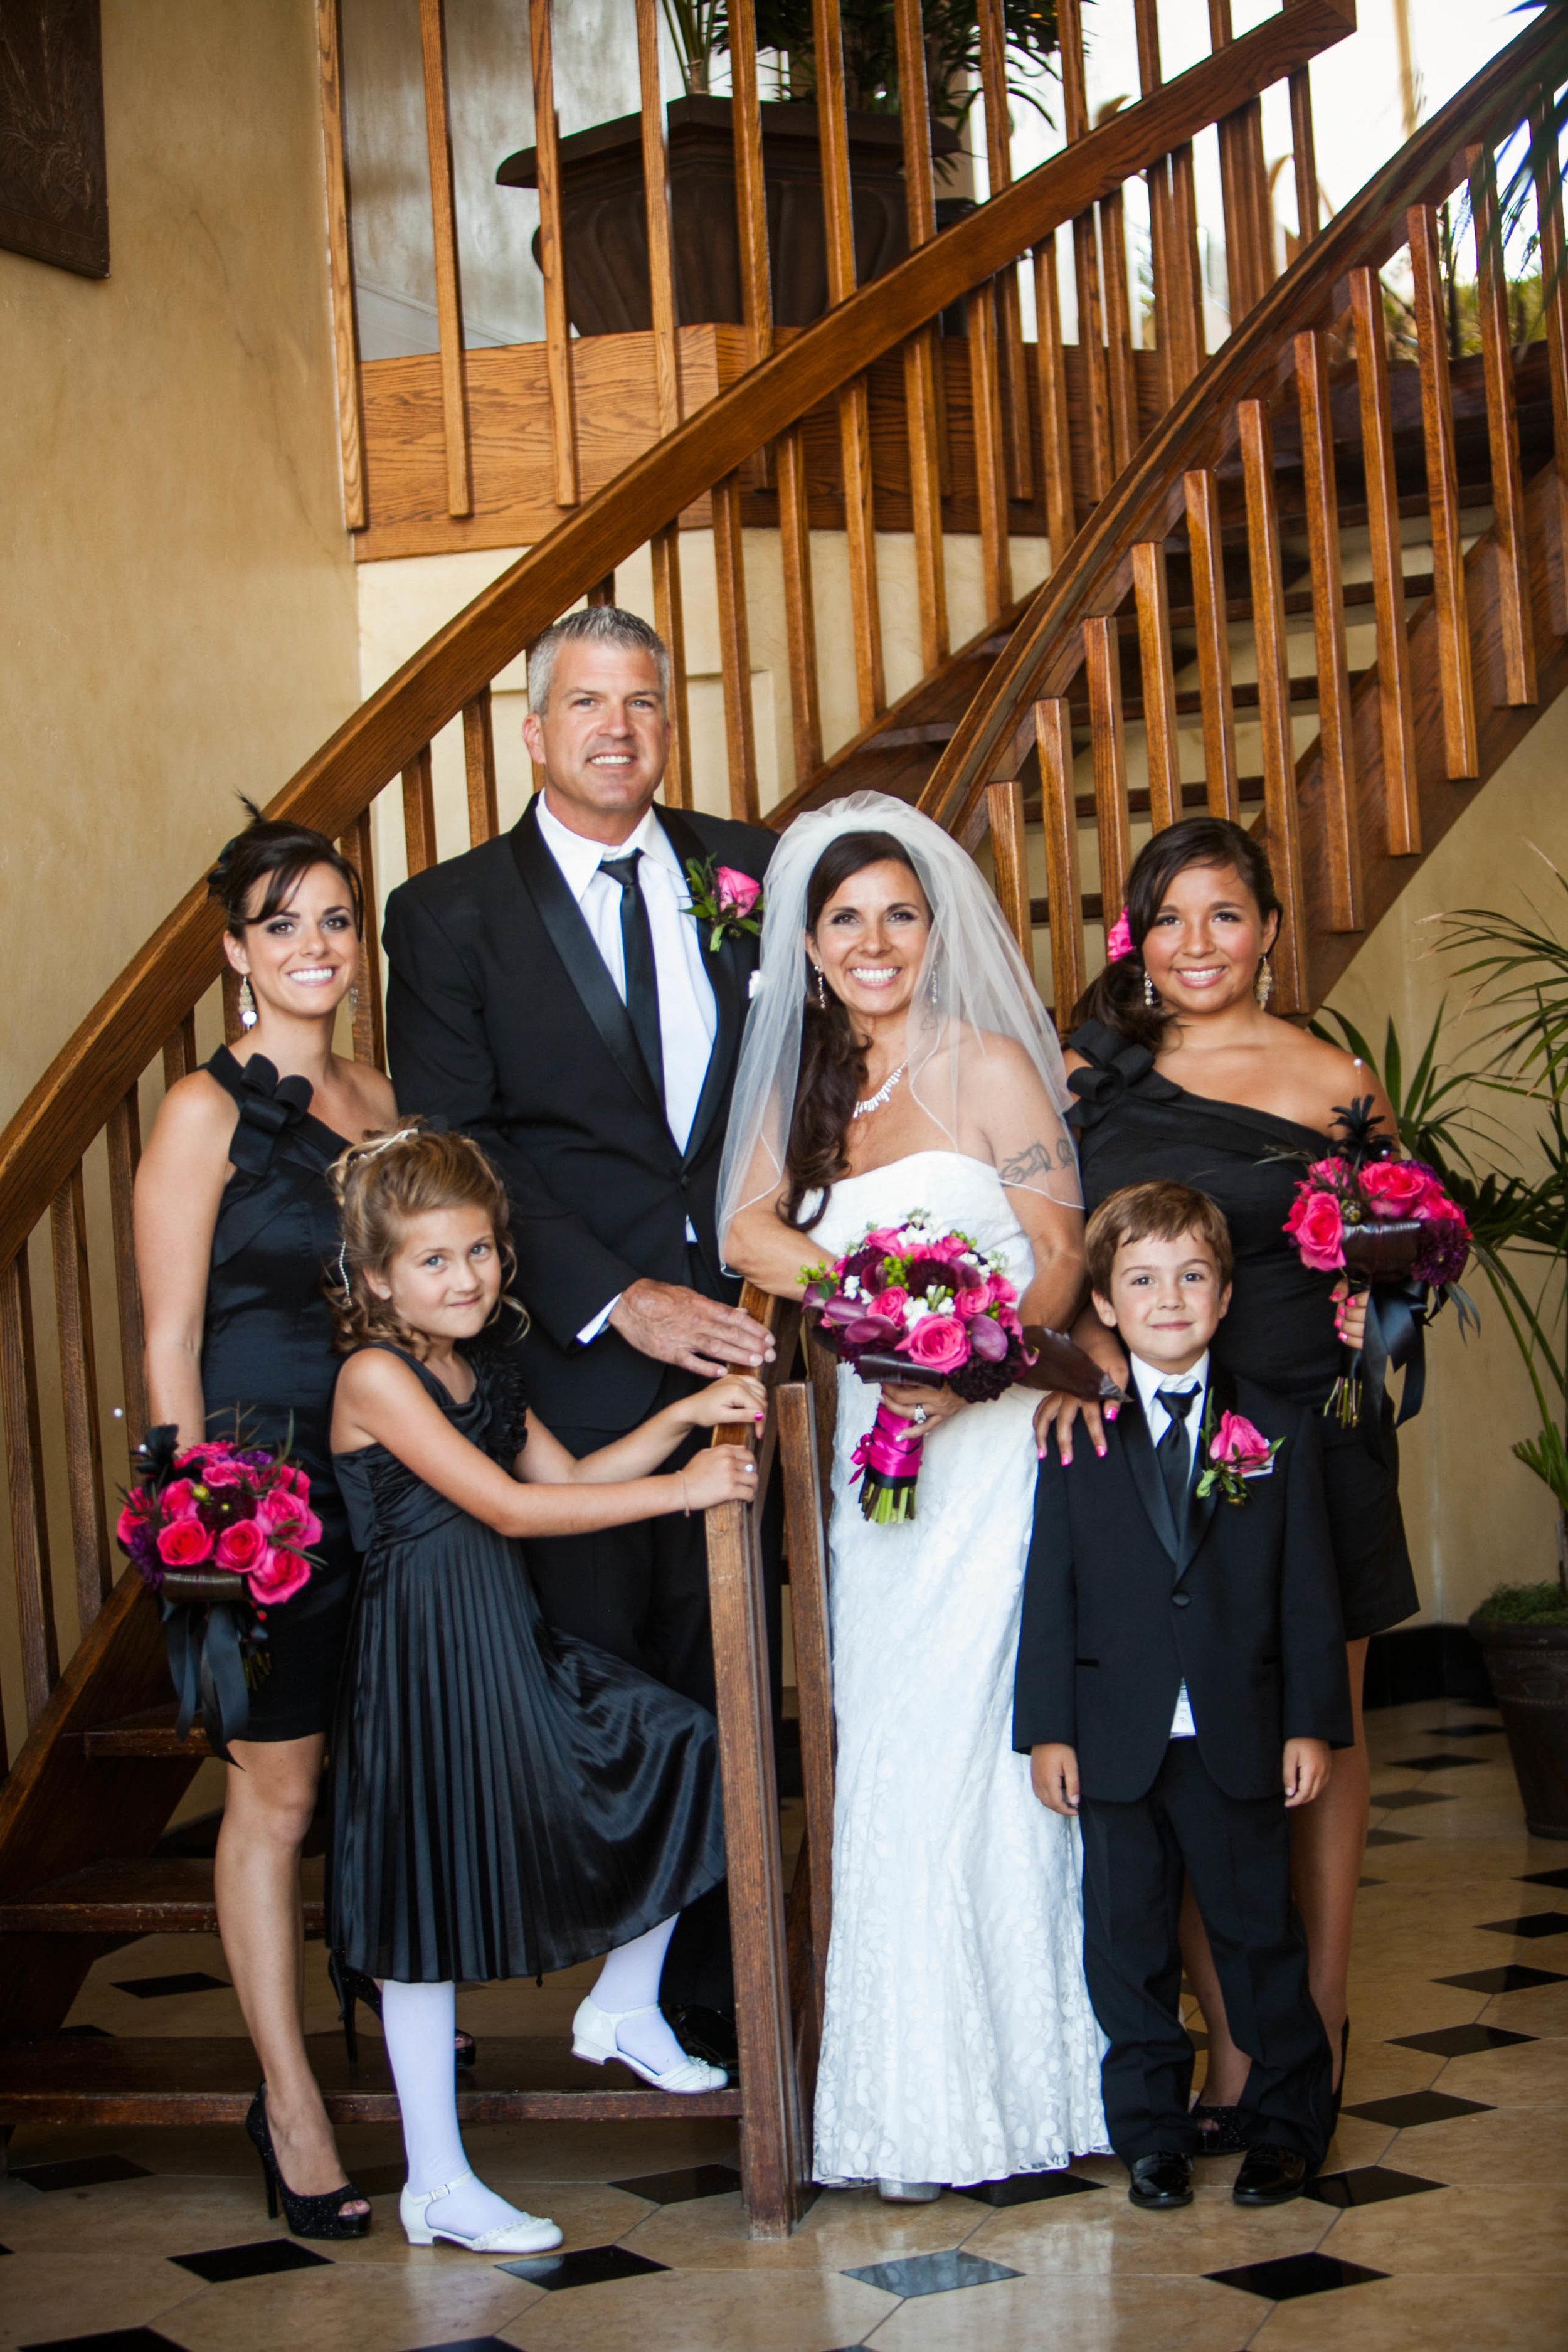 Rhonda_Eric_wedding1457.JPG